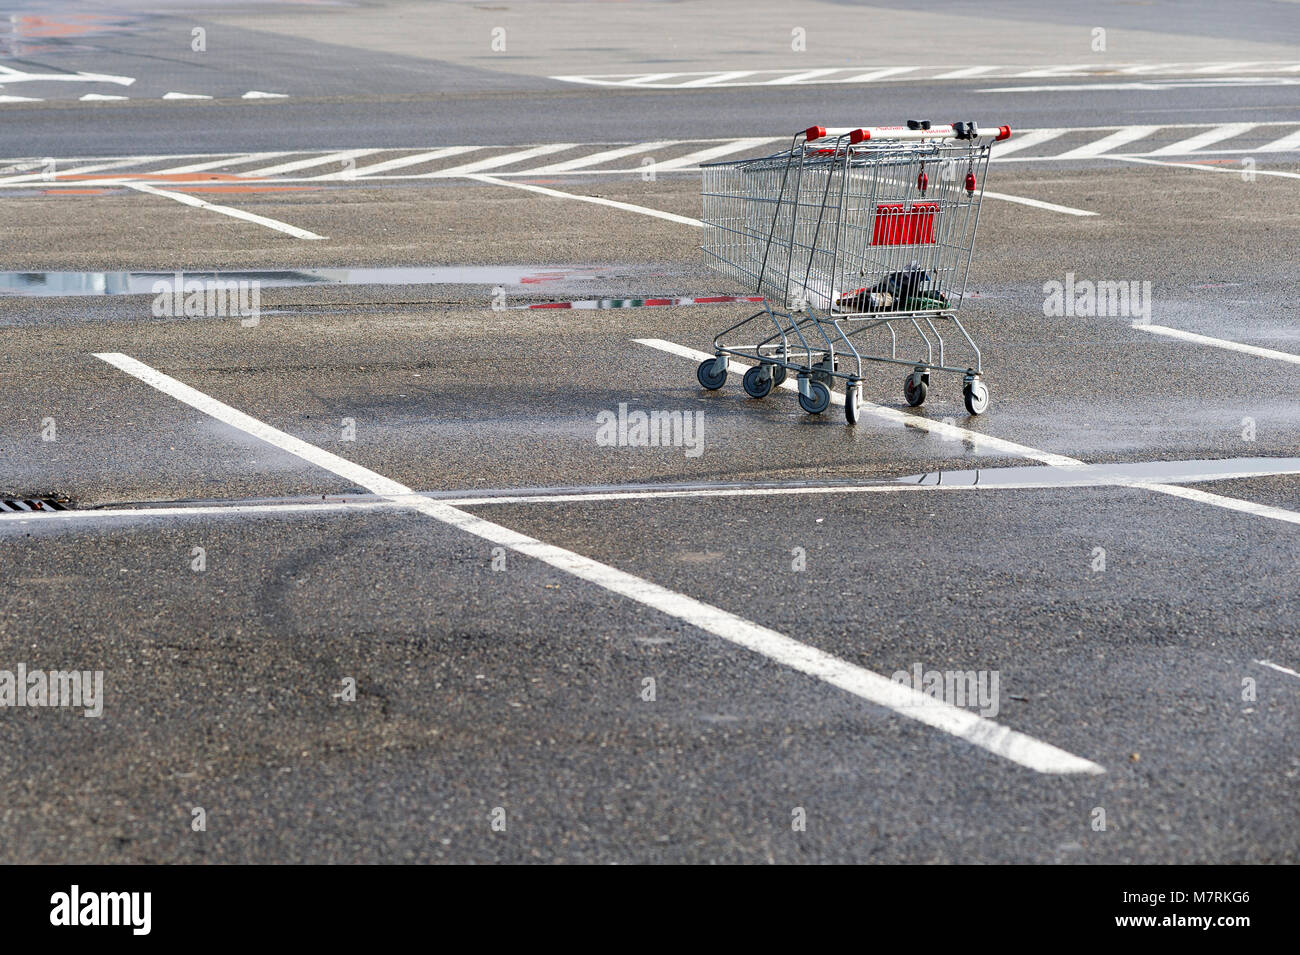 Auchan Stock Photos & Auchan Stock Images - Alamy